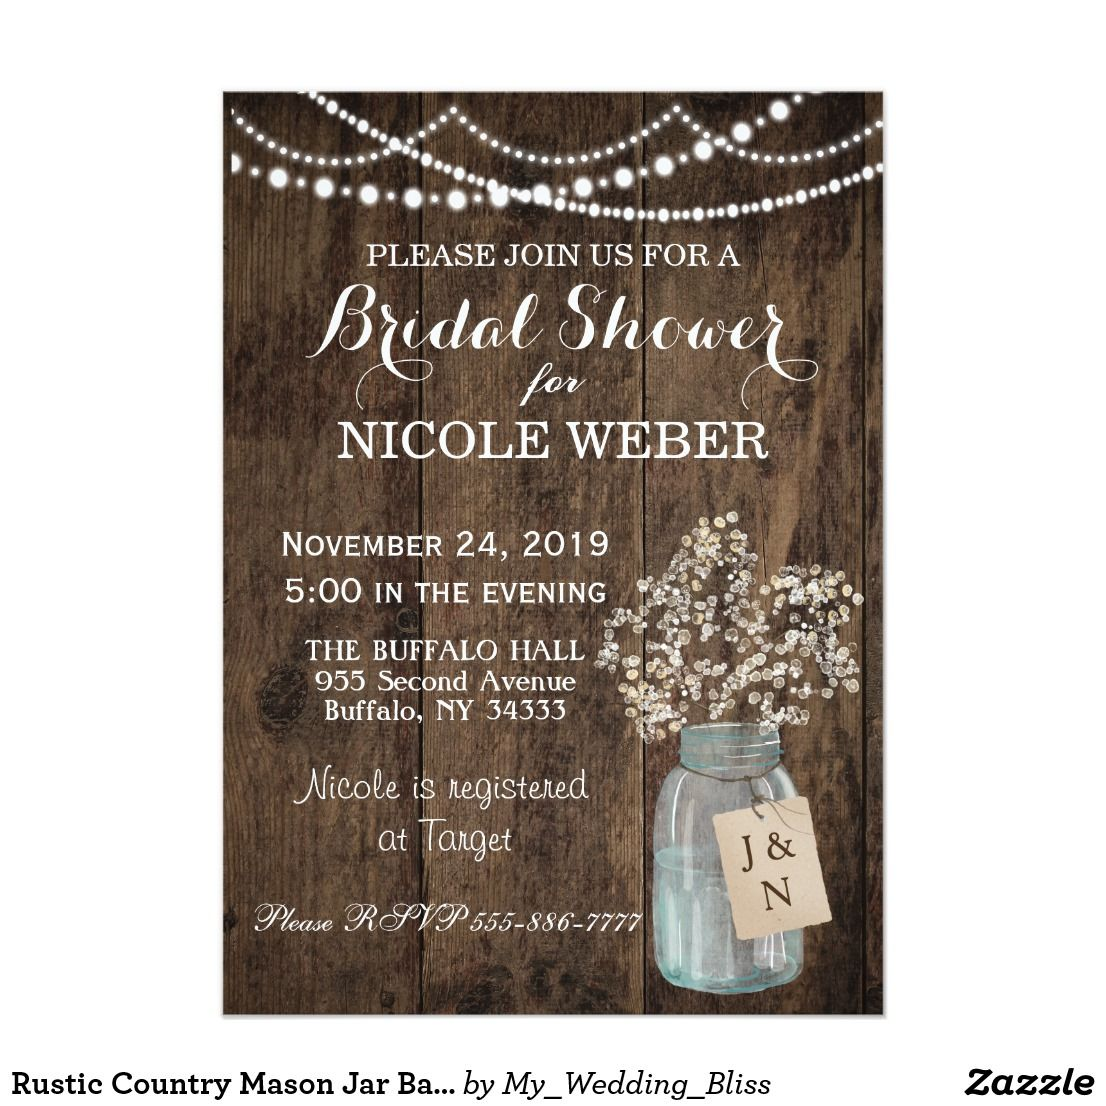 Rustic Country Mason Jar Barn Bridal Shower Invite | Wedding ...